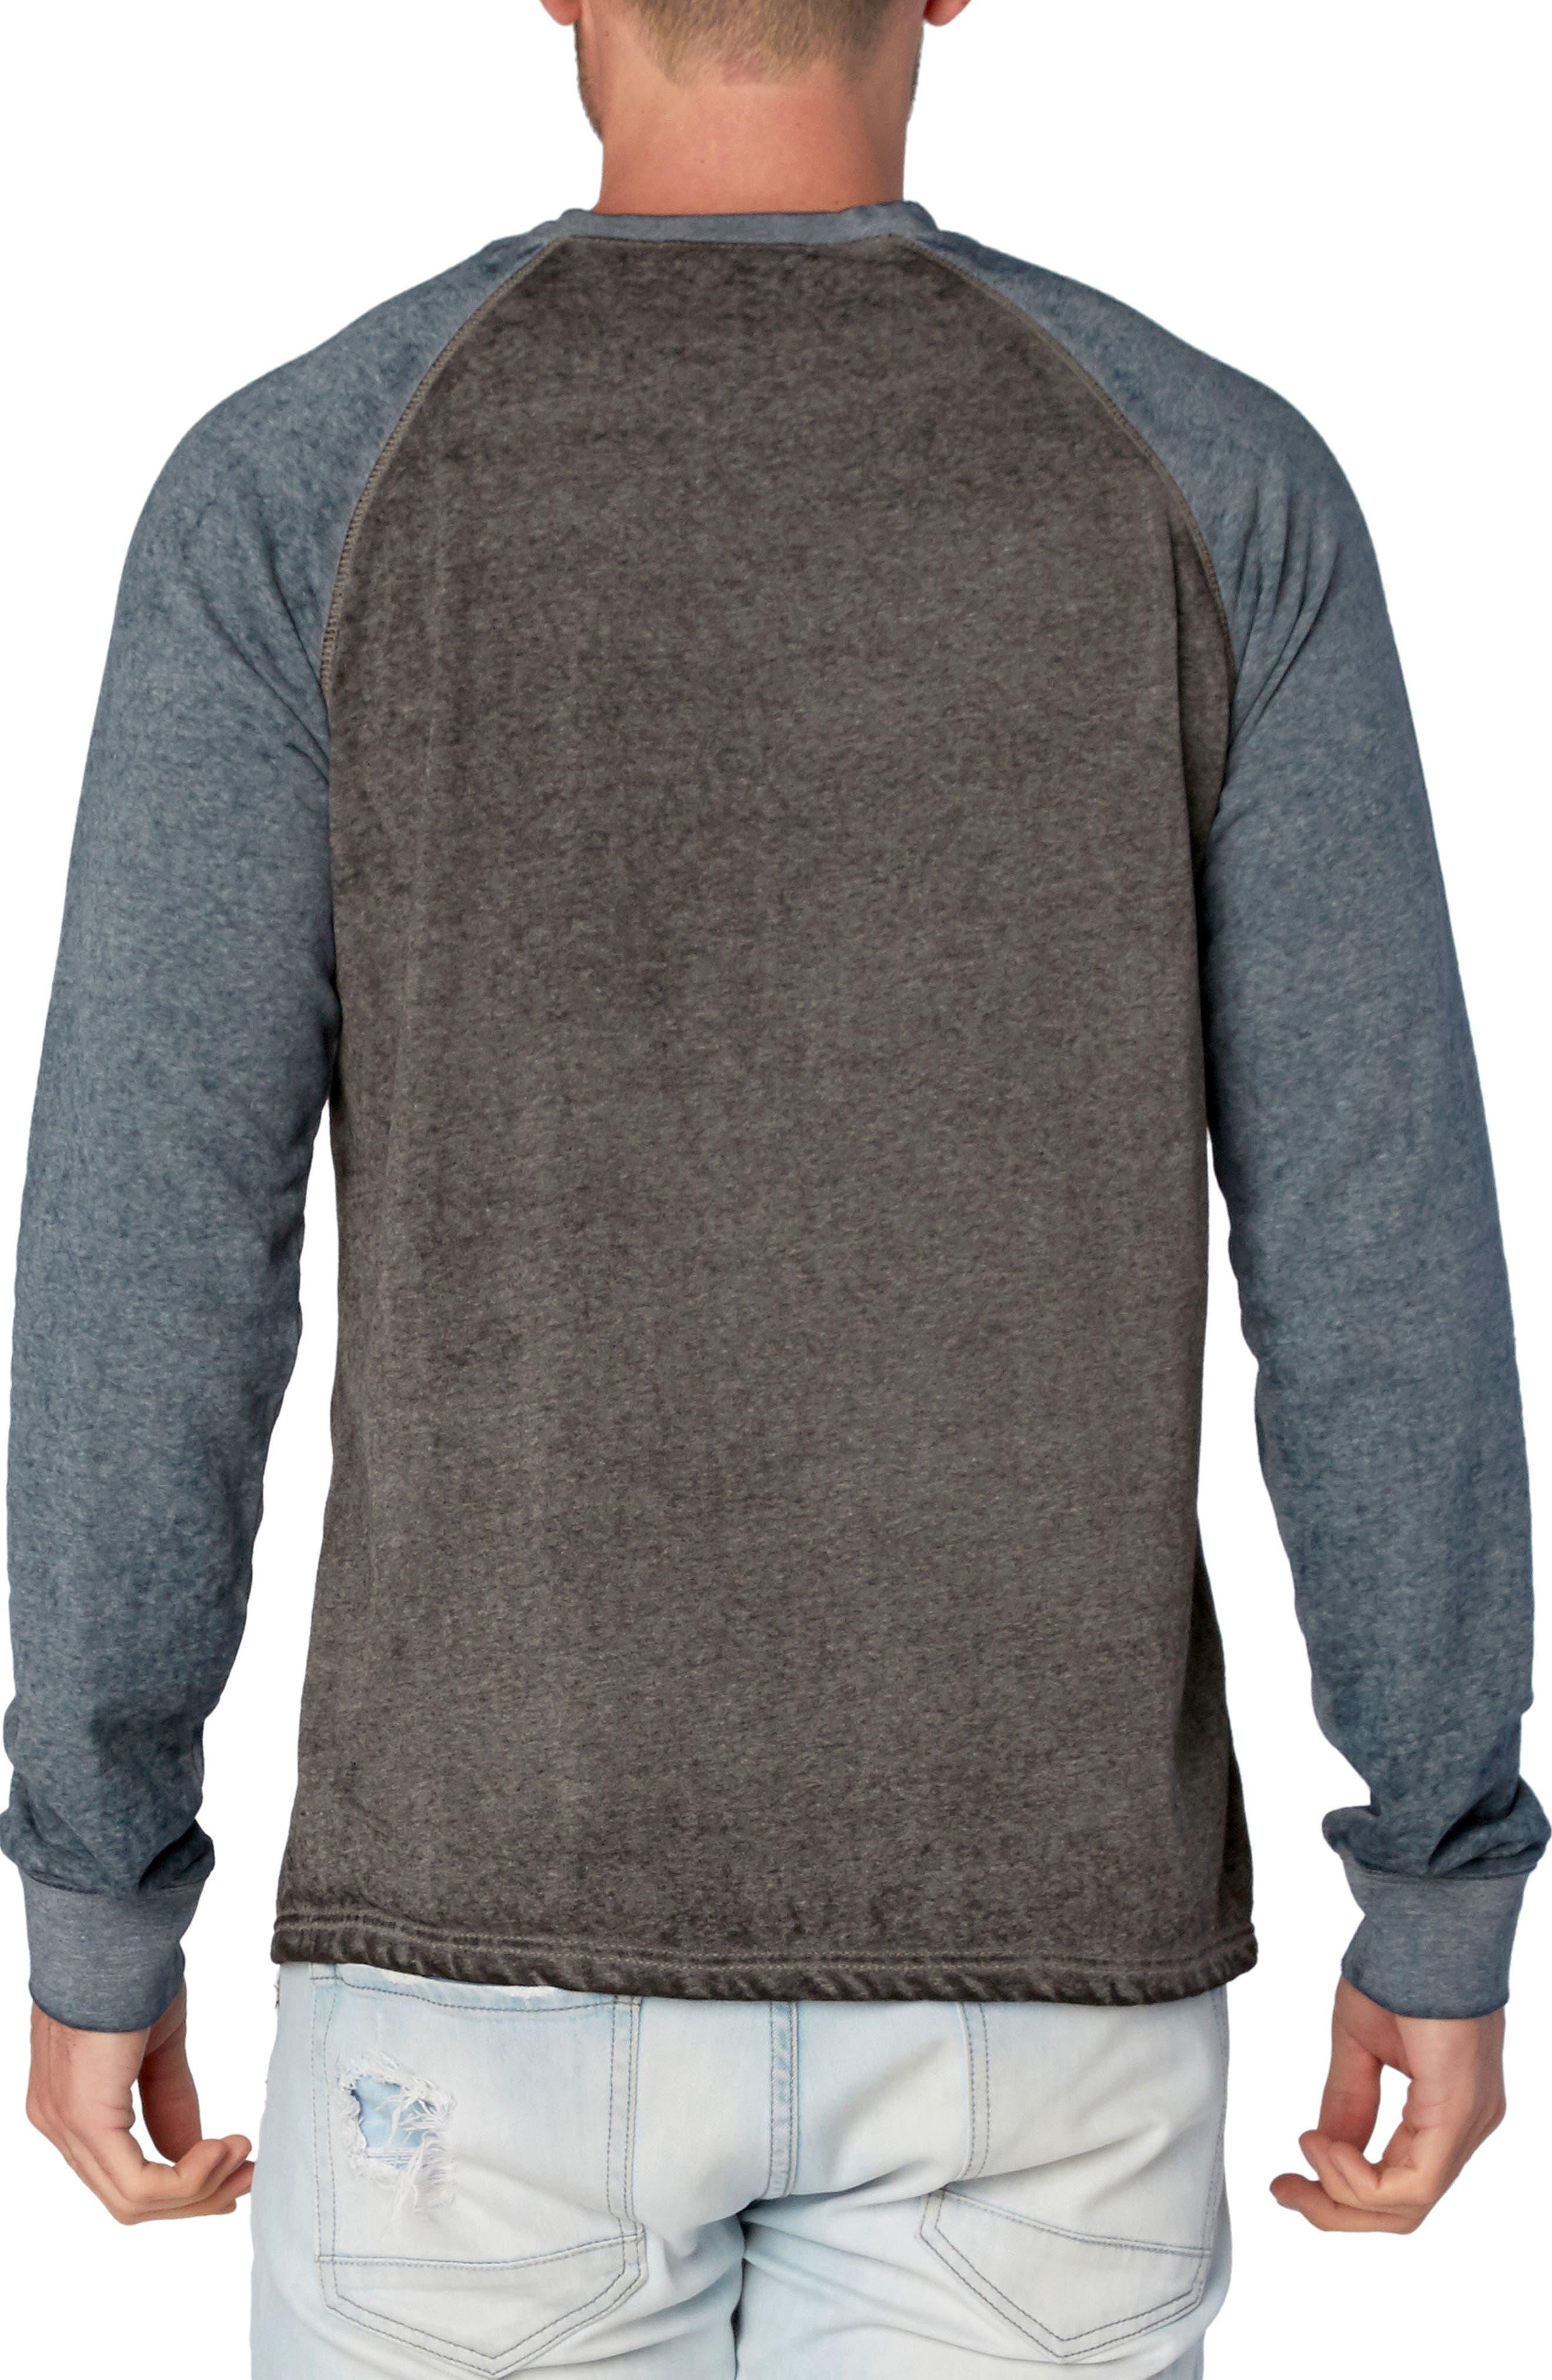 Washed Raglan Sleeve Sweatshirt,                             Alternate thumbnail 2, color,                             001